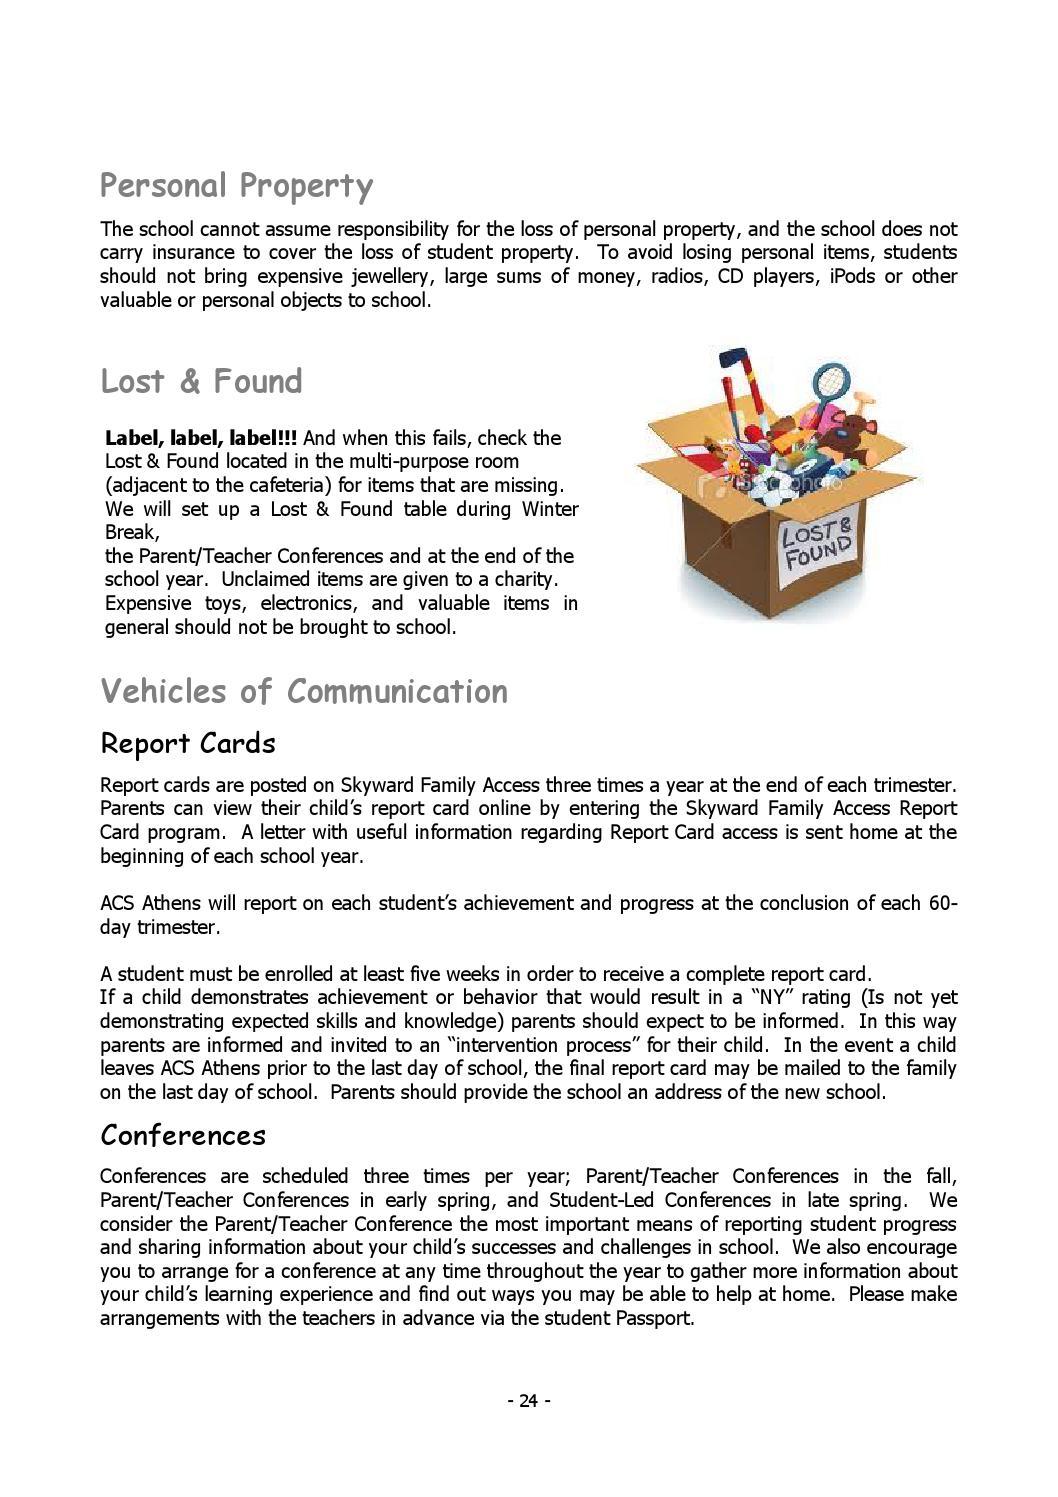 Early Childhood Handbook 2013 - 2014 by ACS Athens - issuu